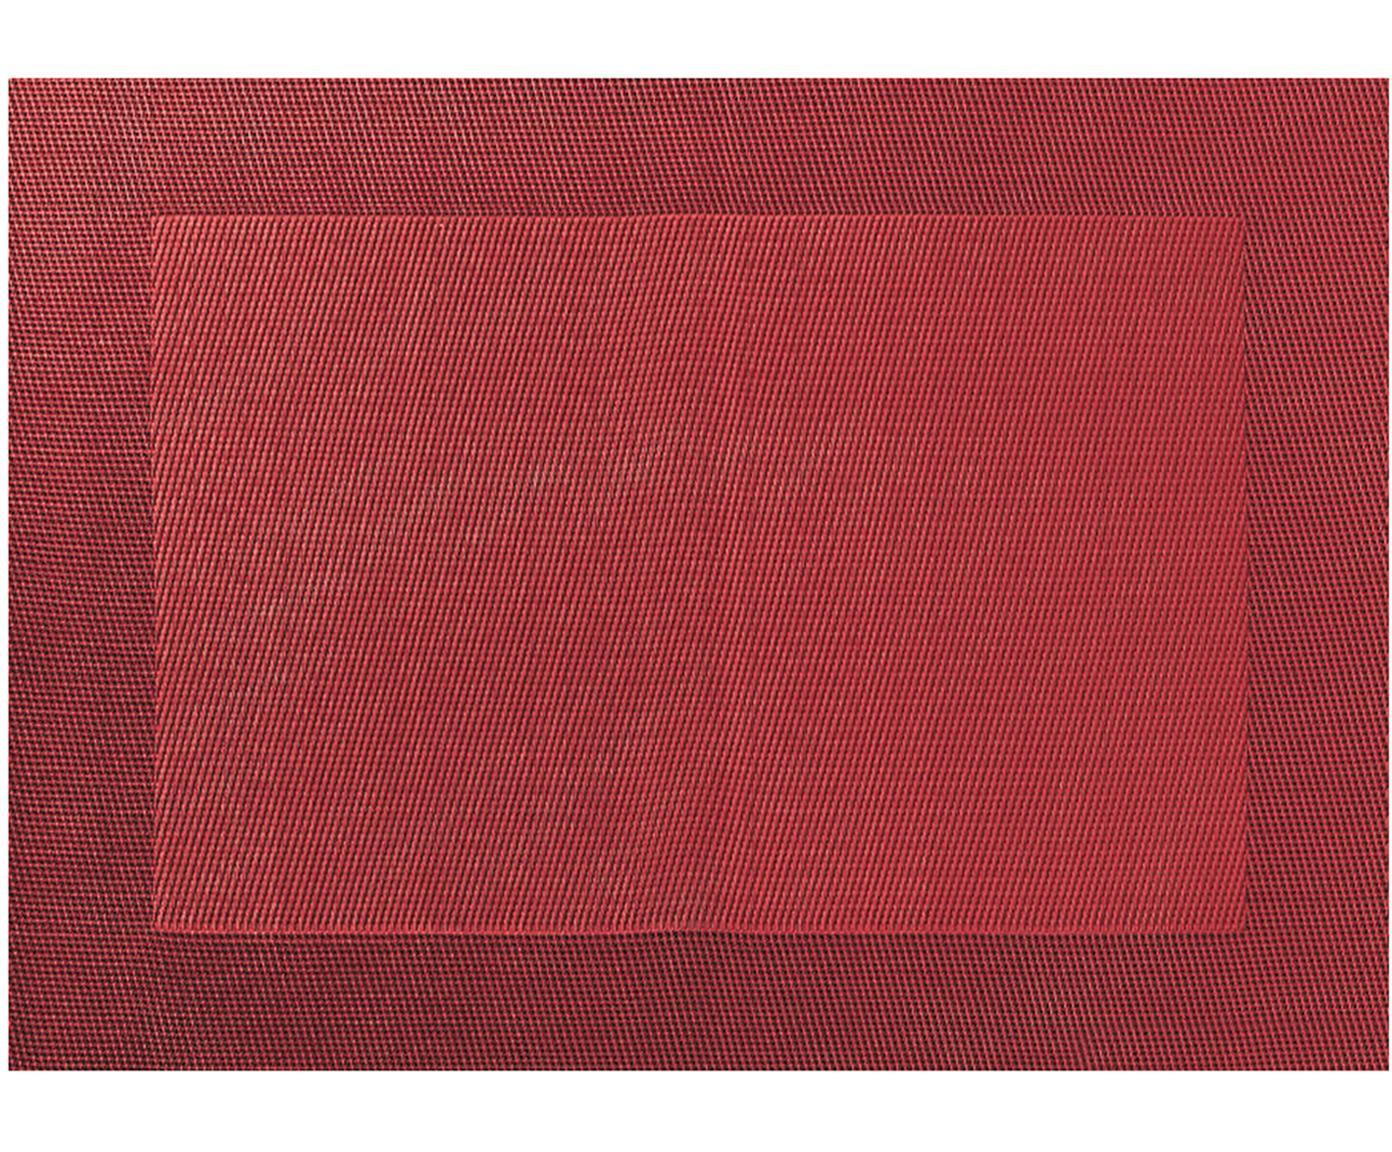 Kunststoff-Tischsets Trefl, 2 Stück, Kunststoff (PVC), Rot, 33 x 46 cm